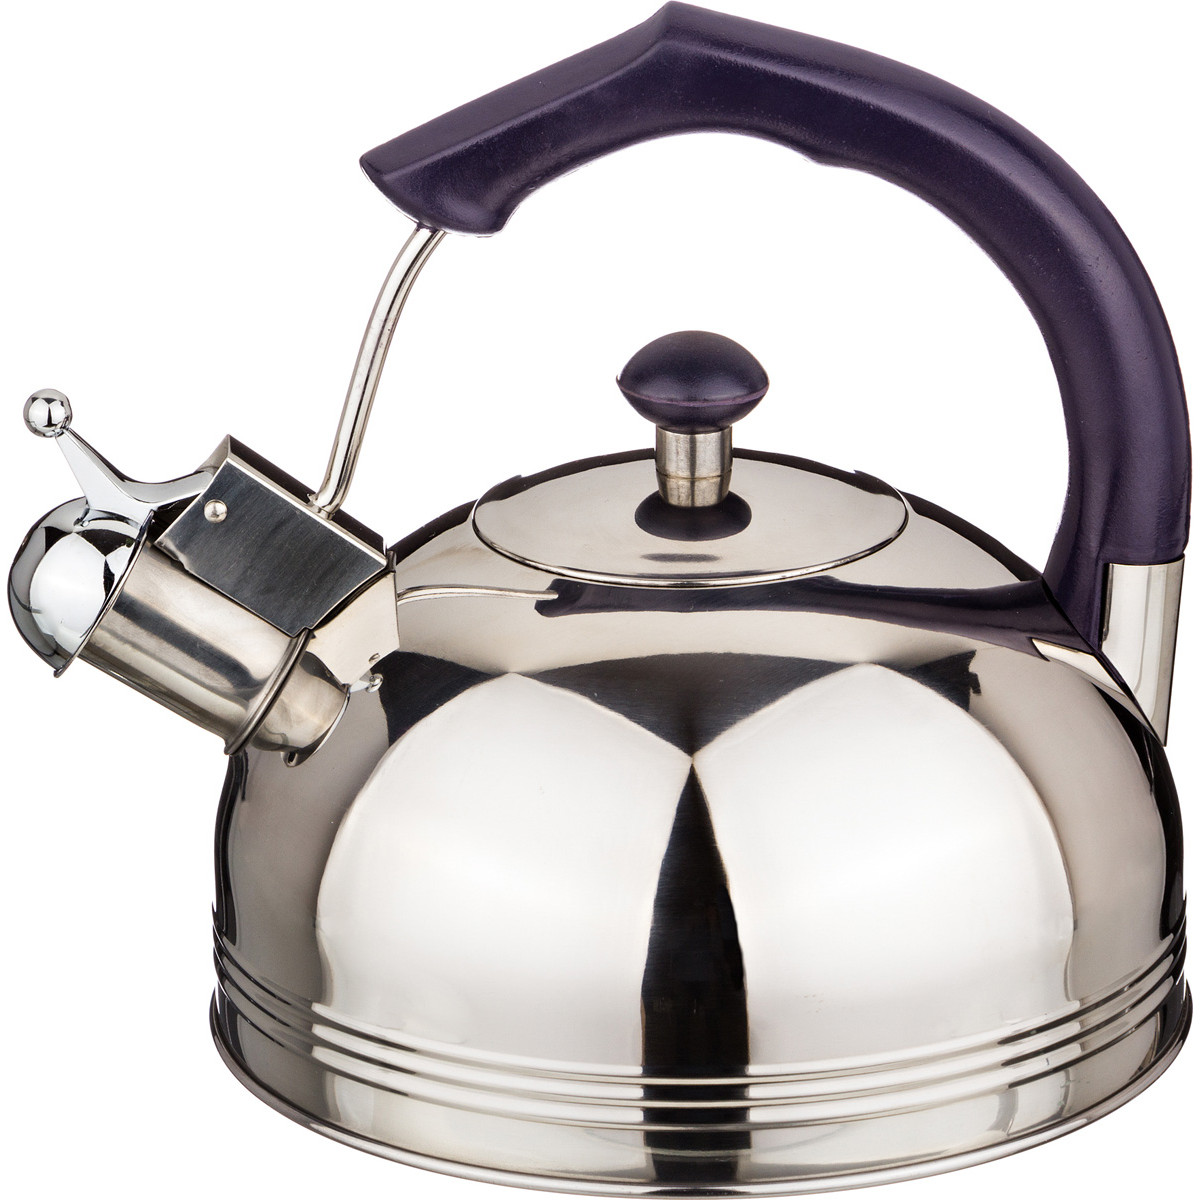 {} Agness Чайник со свистком Alyson  (2500 мл) чайник со свистком cook